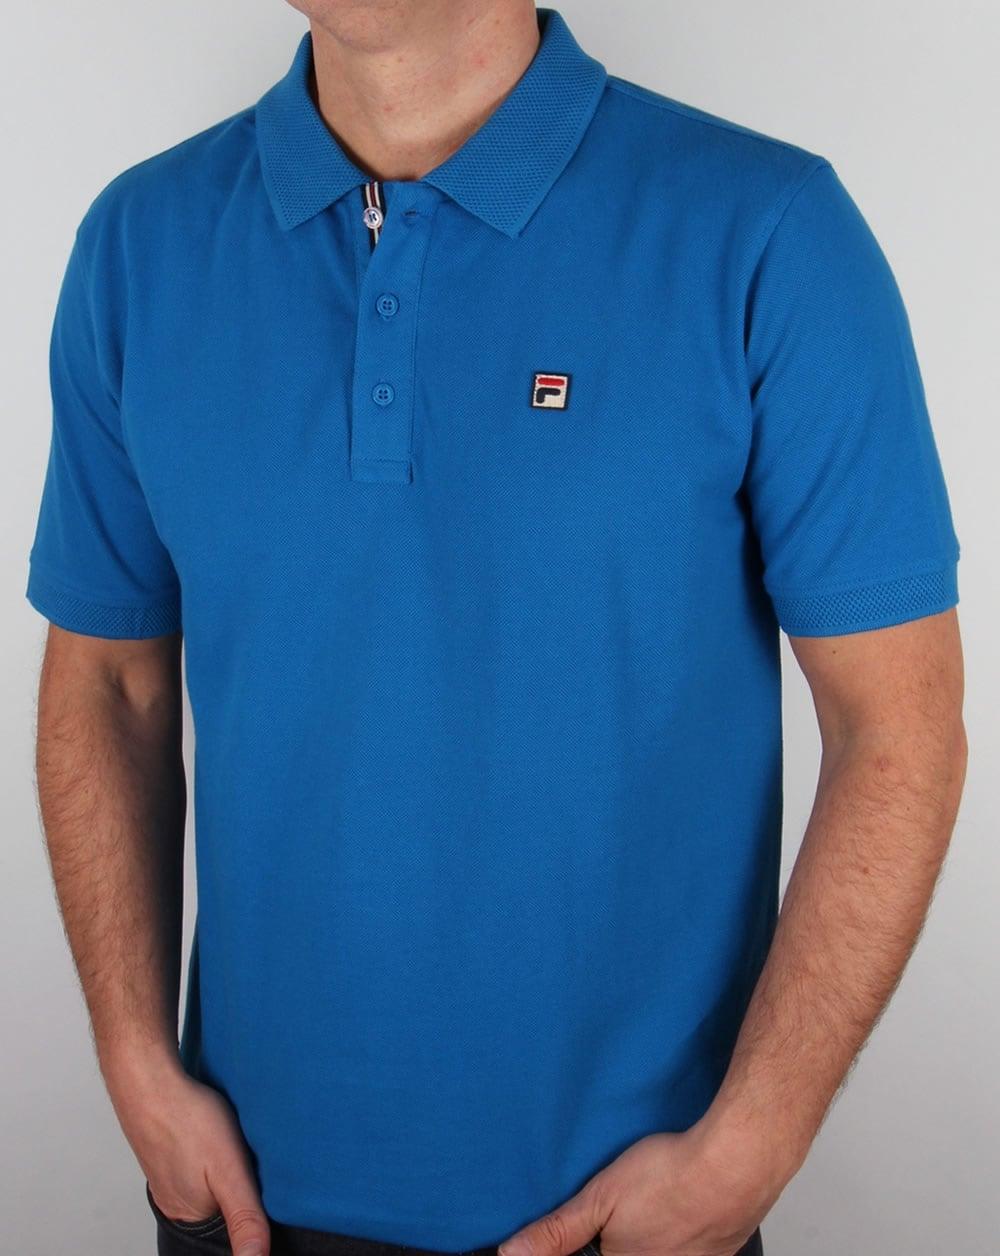 dfc31dd35 Fila Vintage Brizzi Polo Shirt Imperial Blue,cotton,mens,waffle